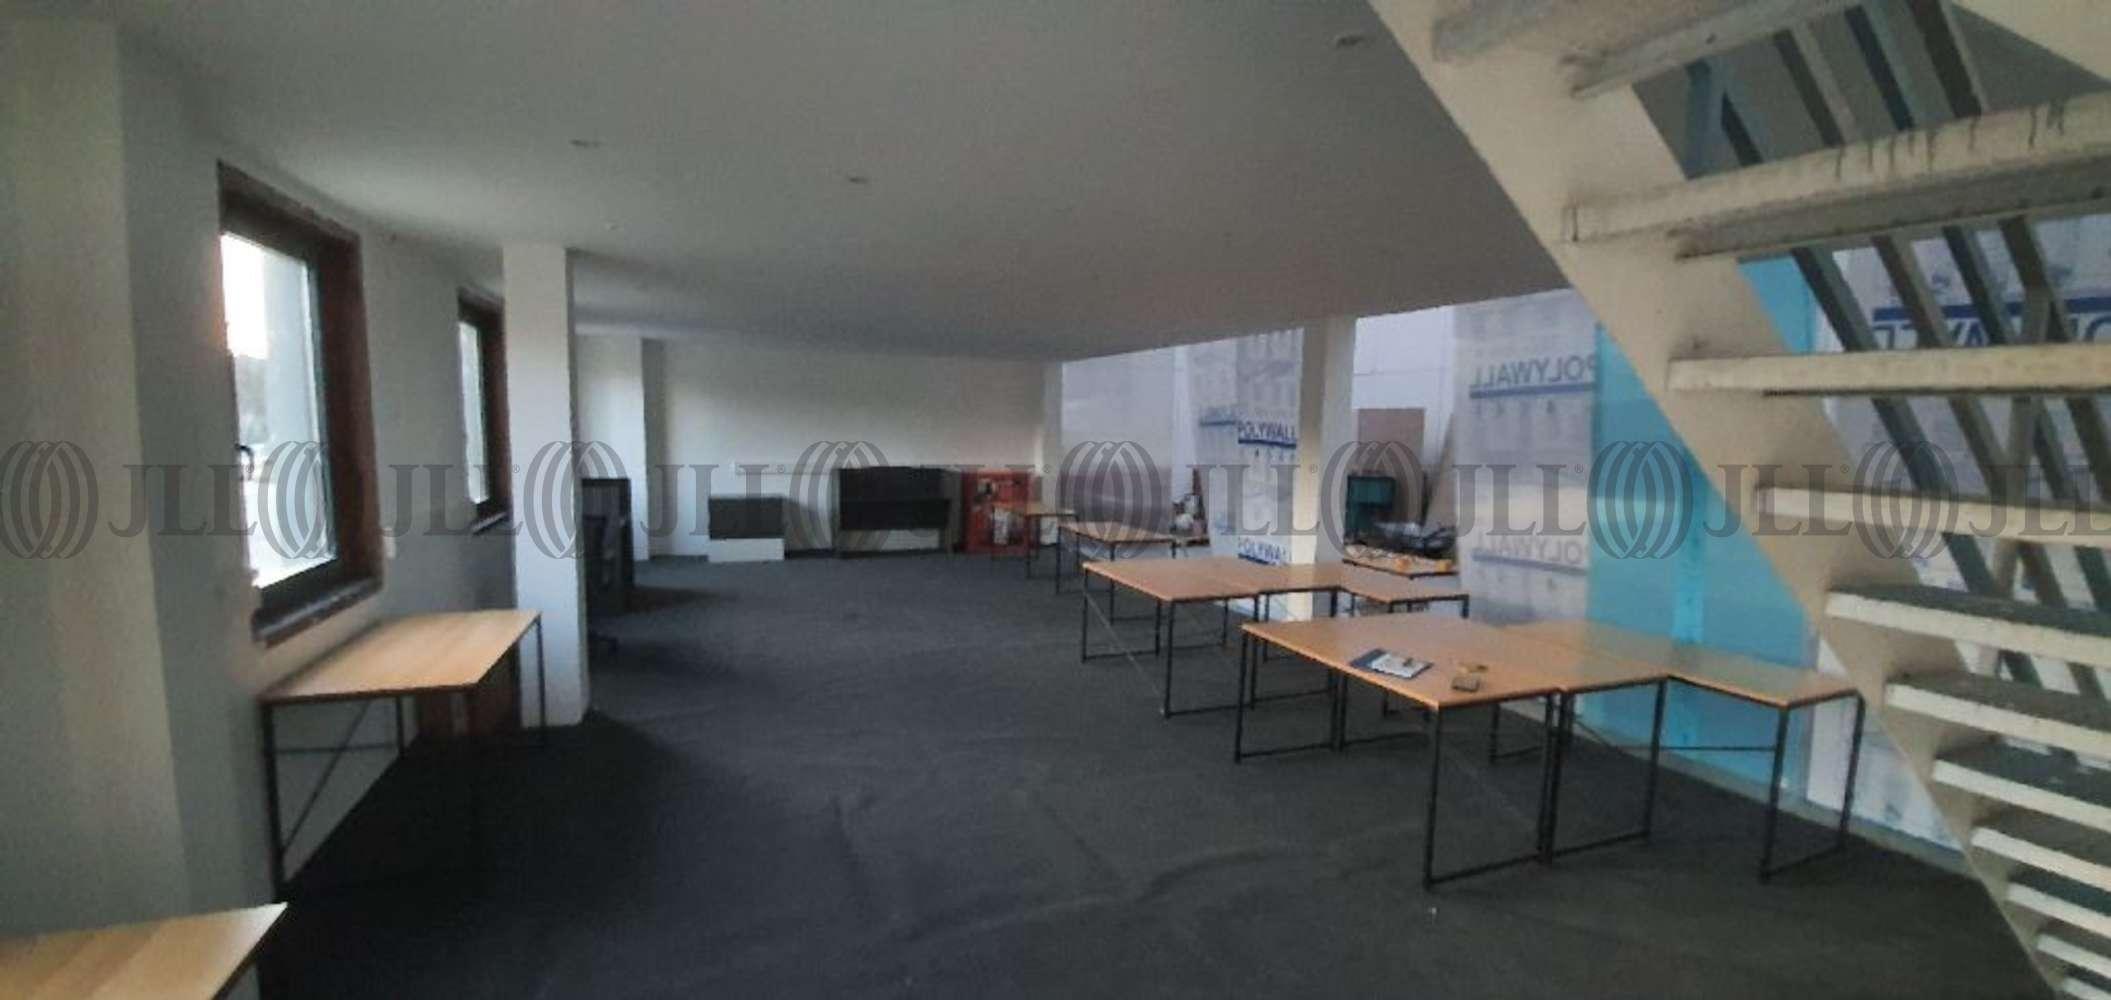 Activités/entrepôt Dardilly, 69570 - Location locaux d'activité Dardilly Lyon - 10921715